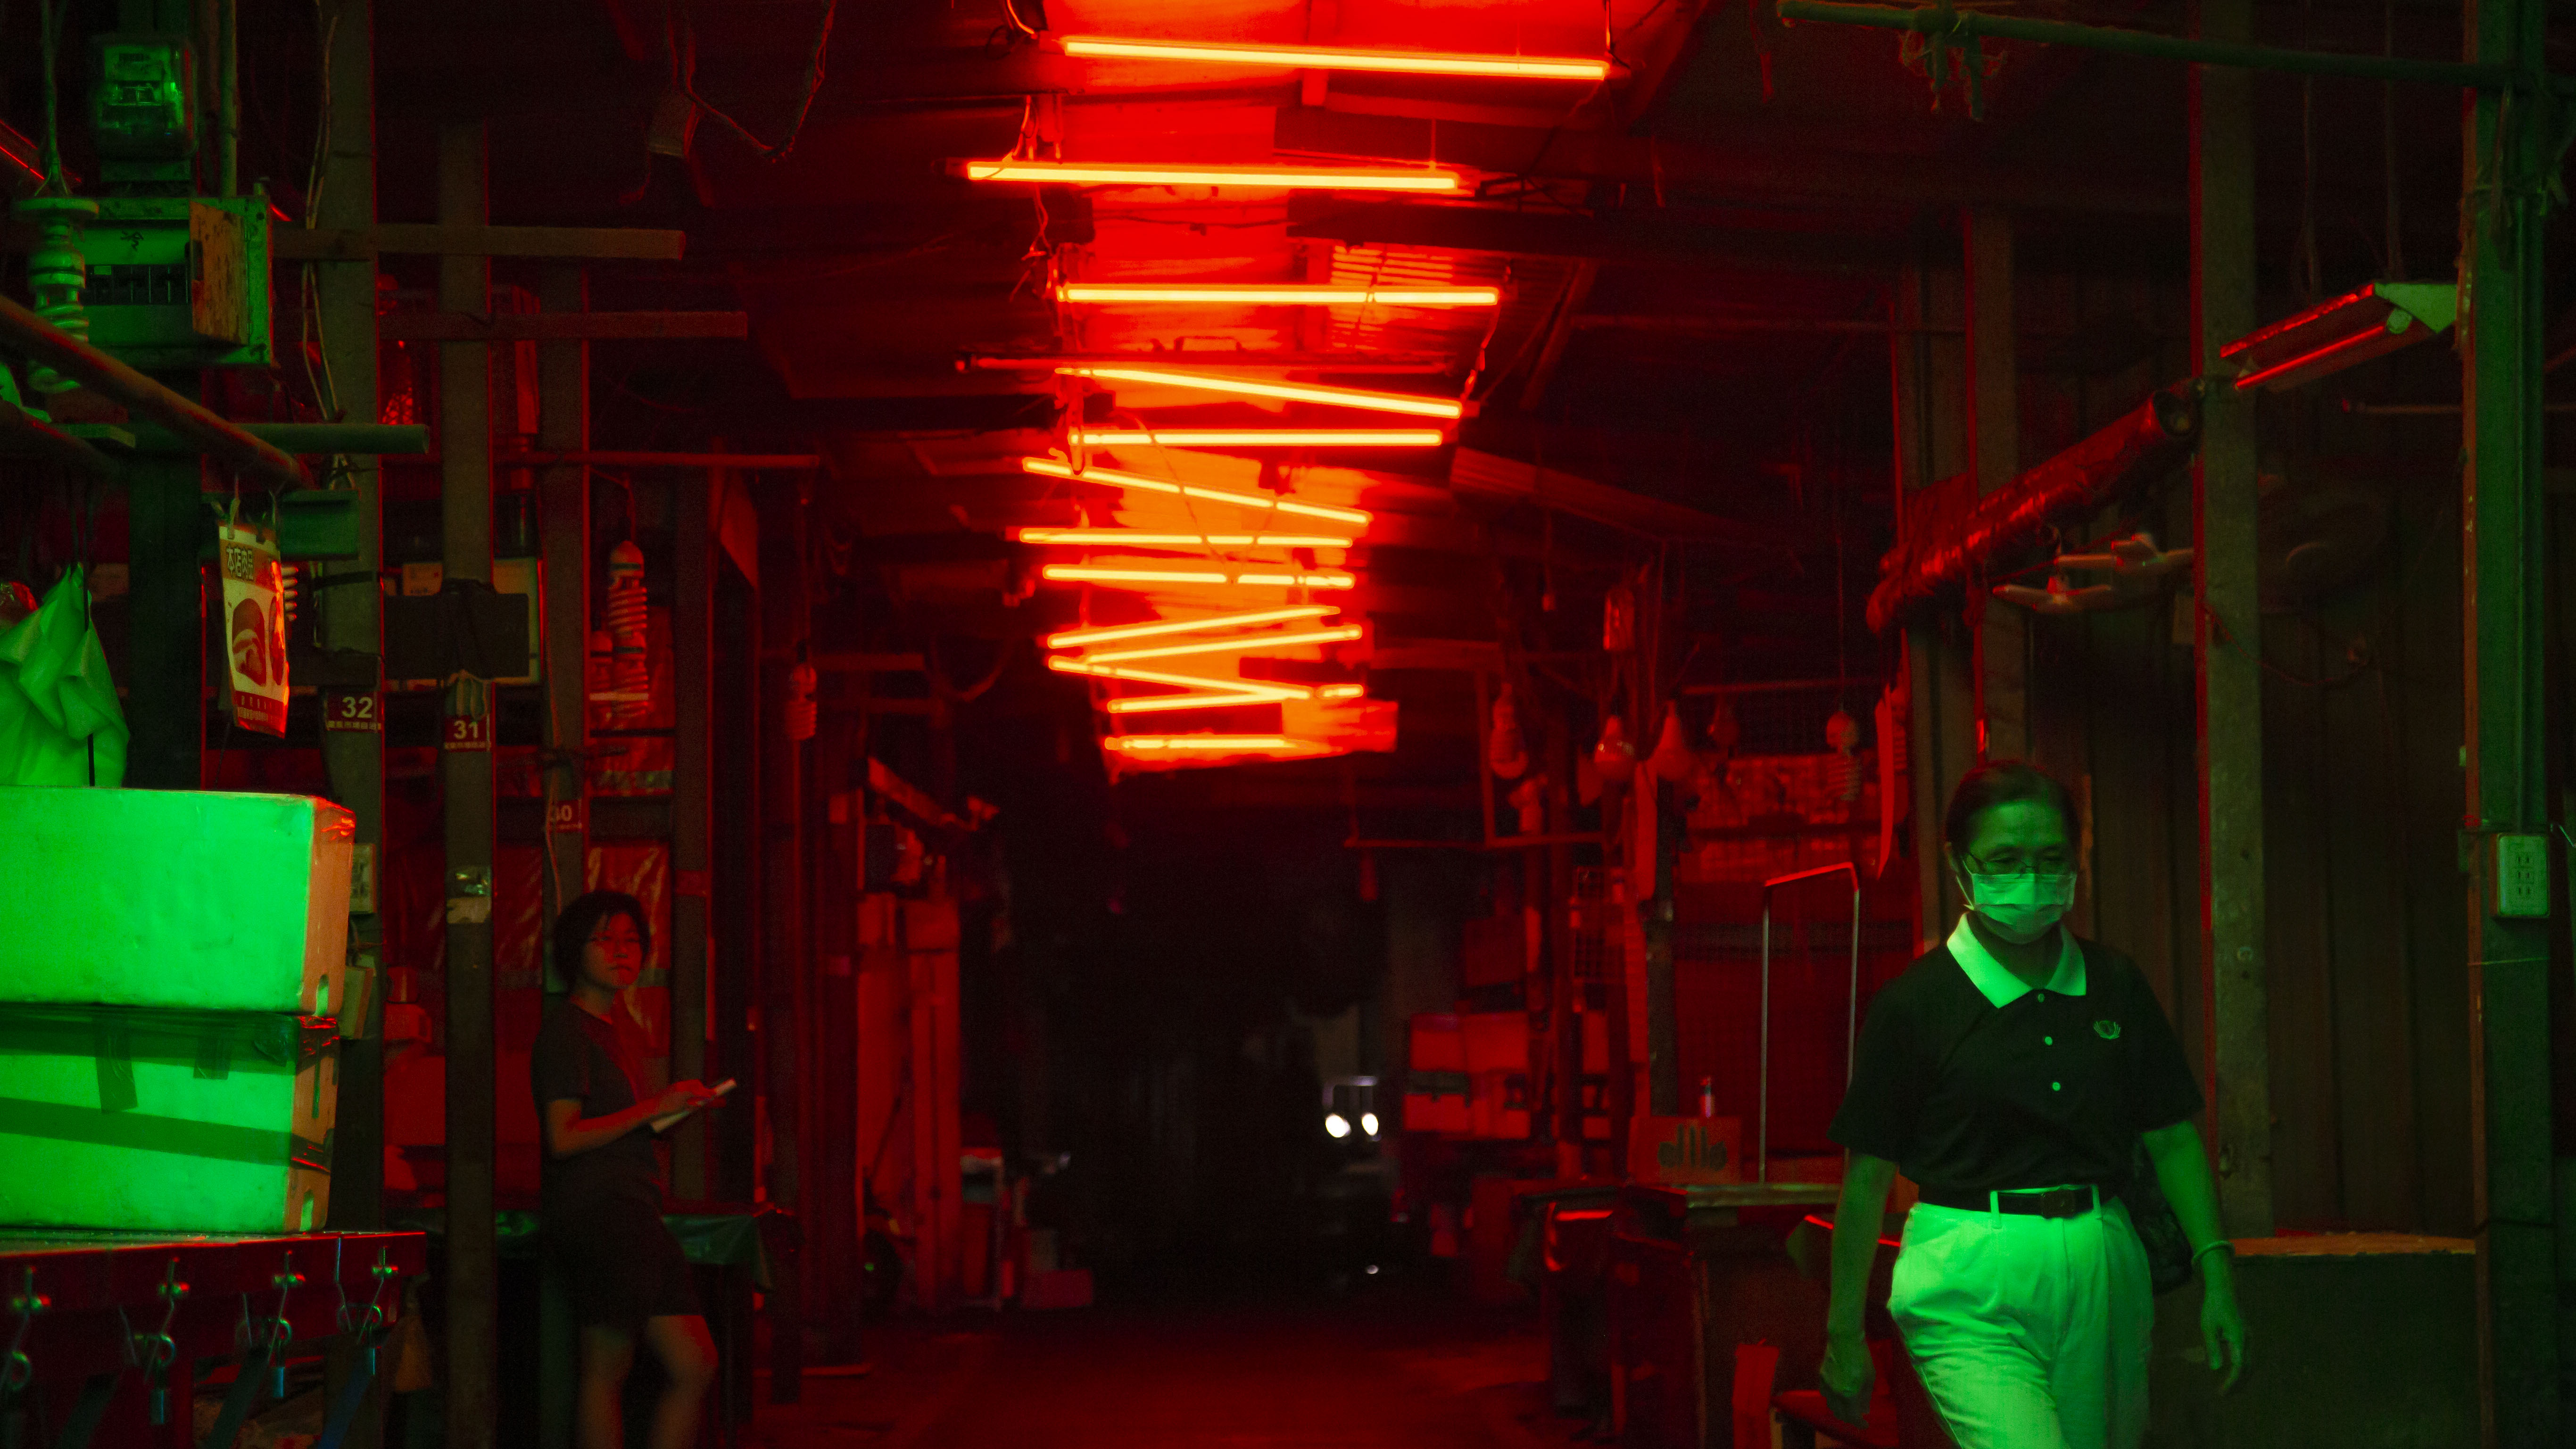 《435Display 線在就要看》「台北機電人2.0:訊息瘟疫 II」@龍泉市場